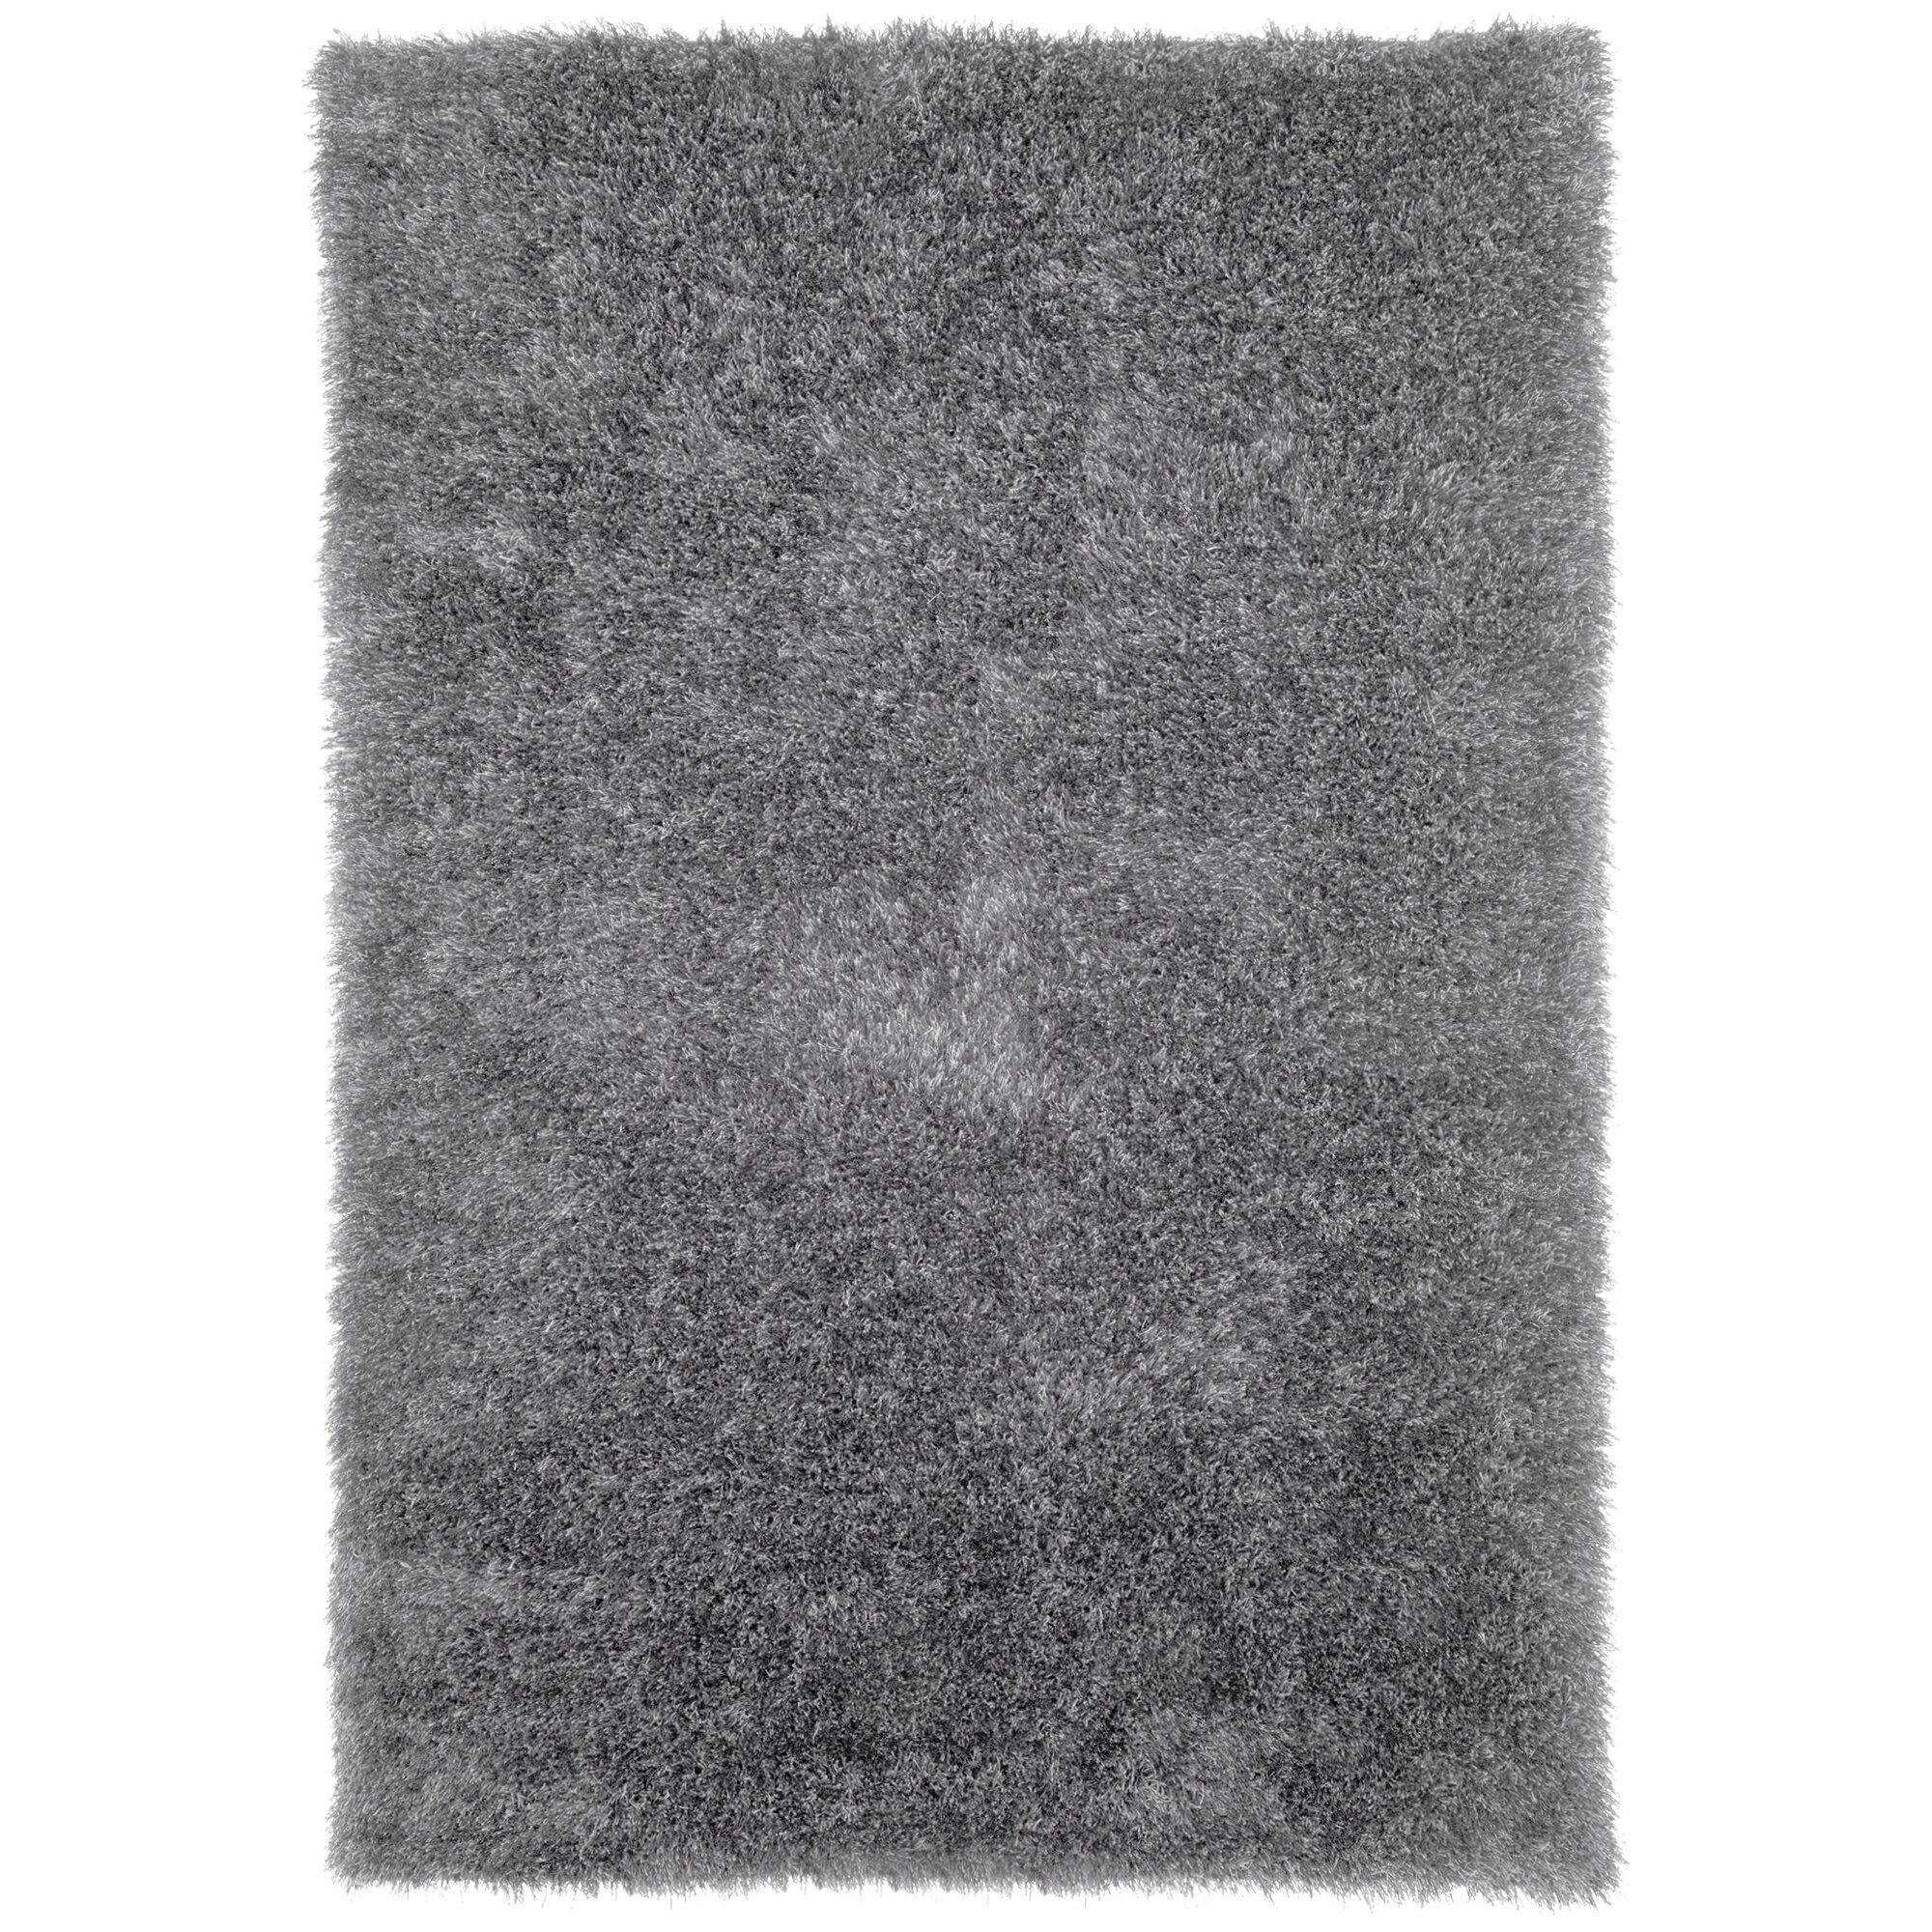 Lavish Home Gray Shag Area Rug Reviews Wayfair